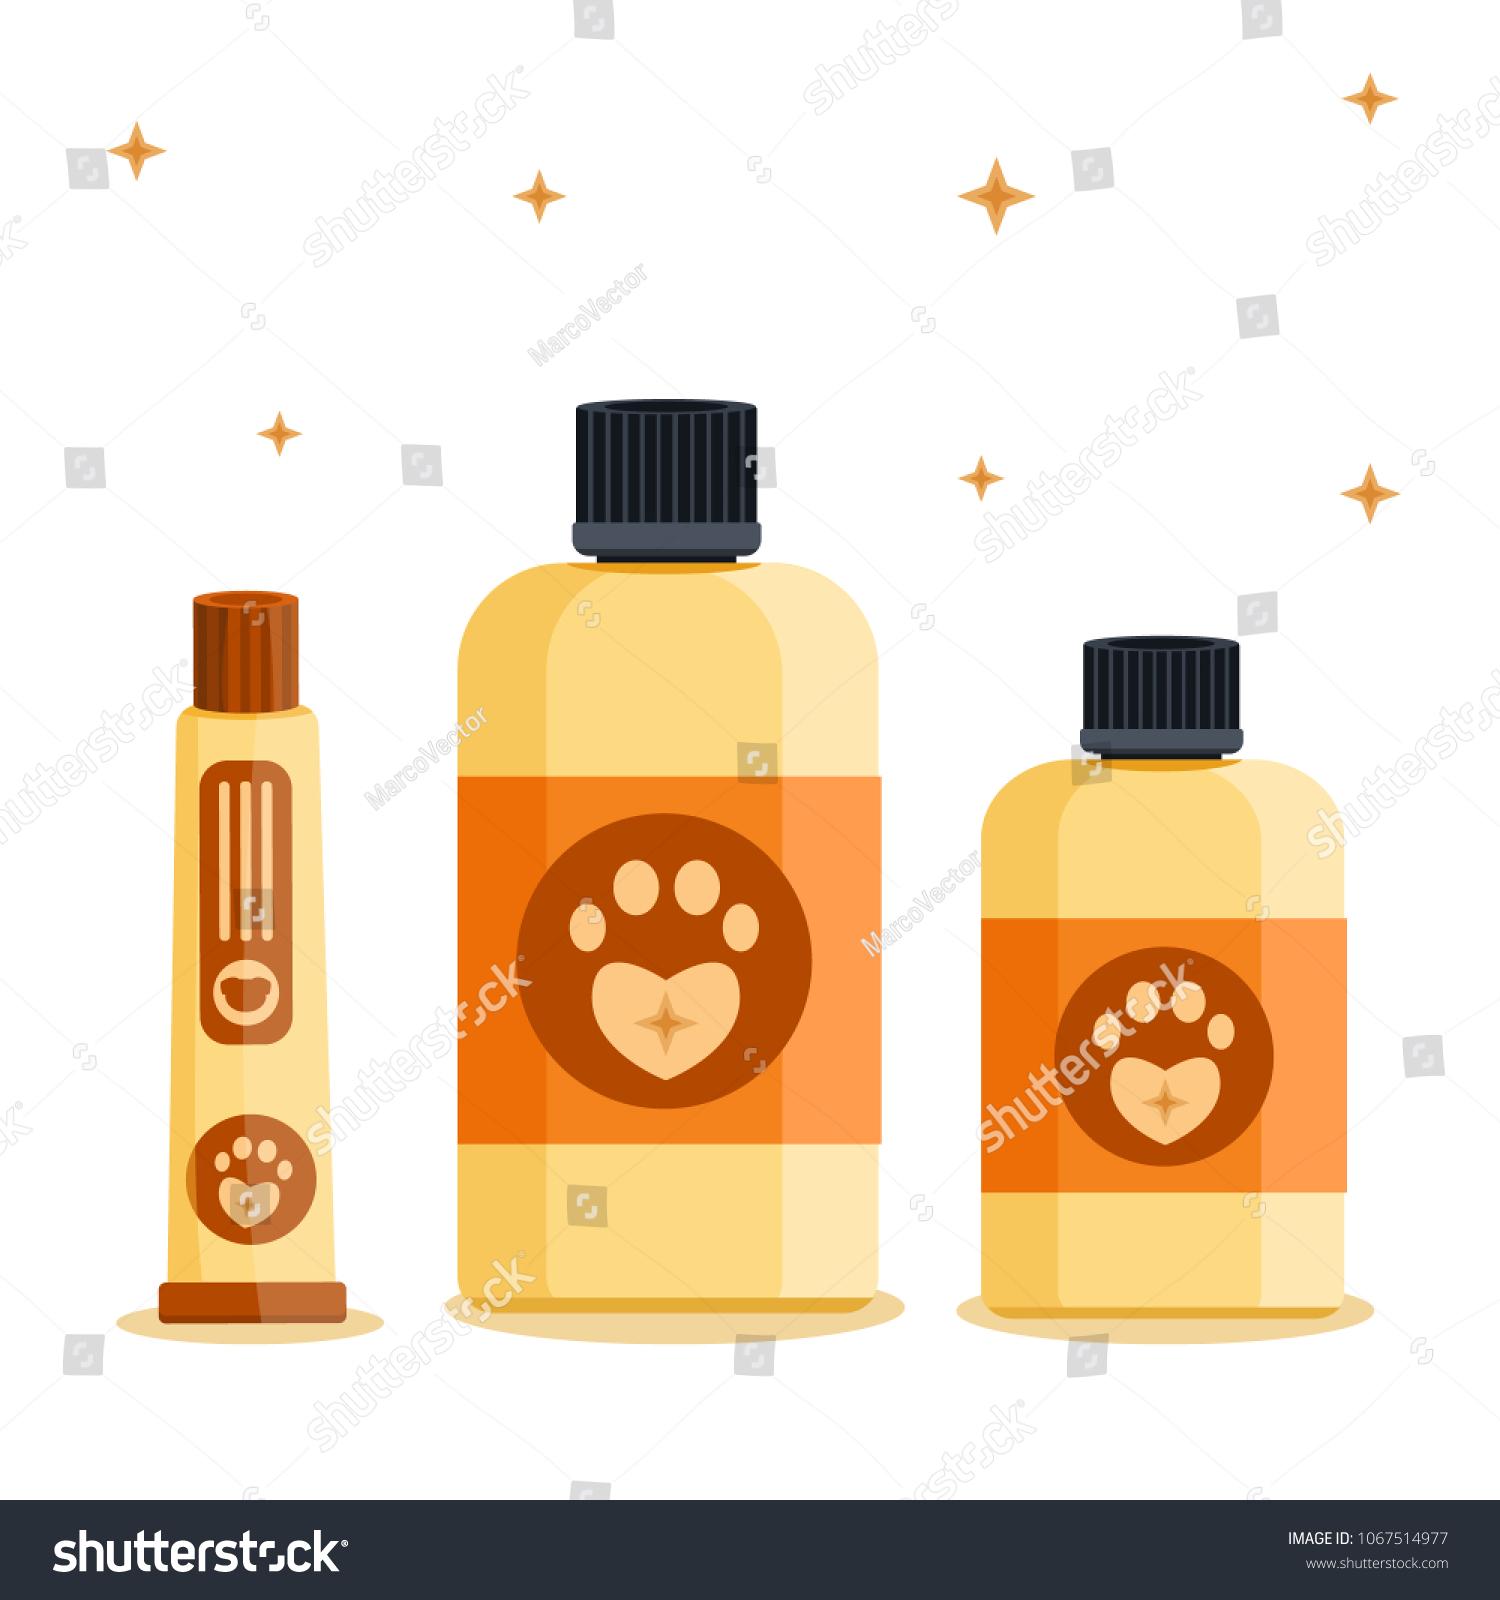 Luxury Rich Cute Biege Vintage Retro Stock Vector Royalty Free Lampu Salon Barber Grooming Beauty Saloon Shop Dog Pet Cat Animal Tracks Barbershop